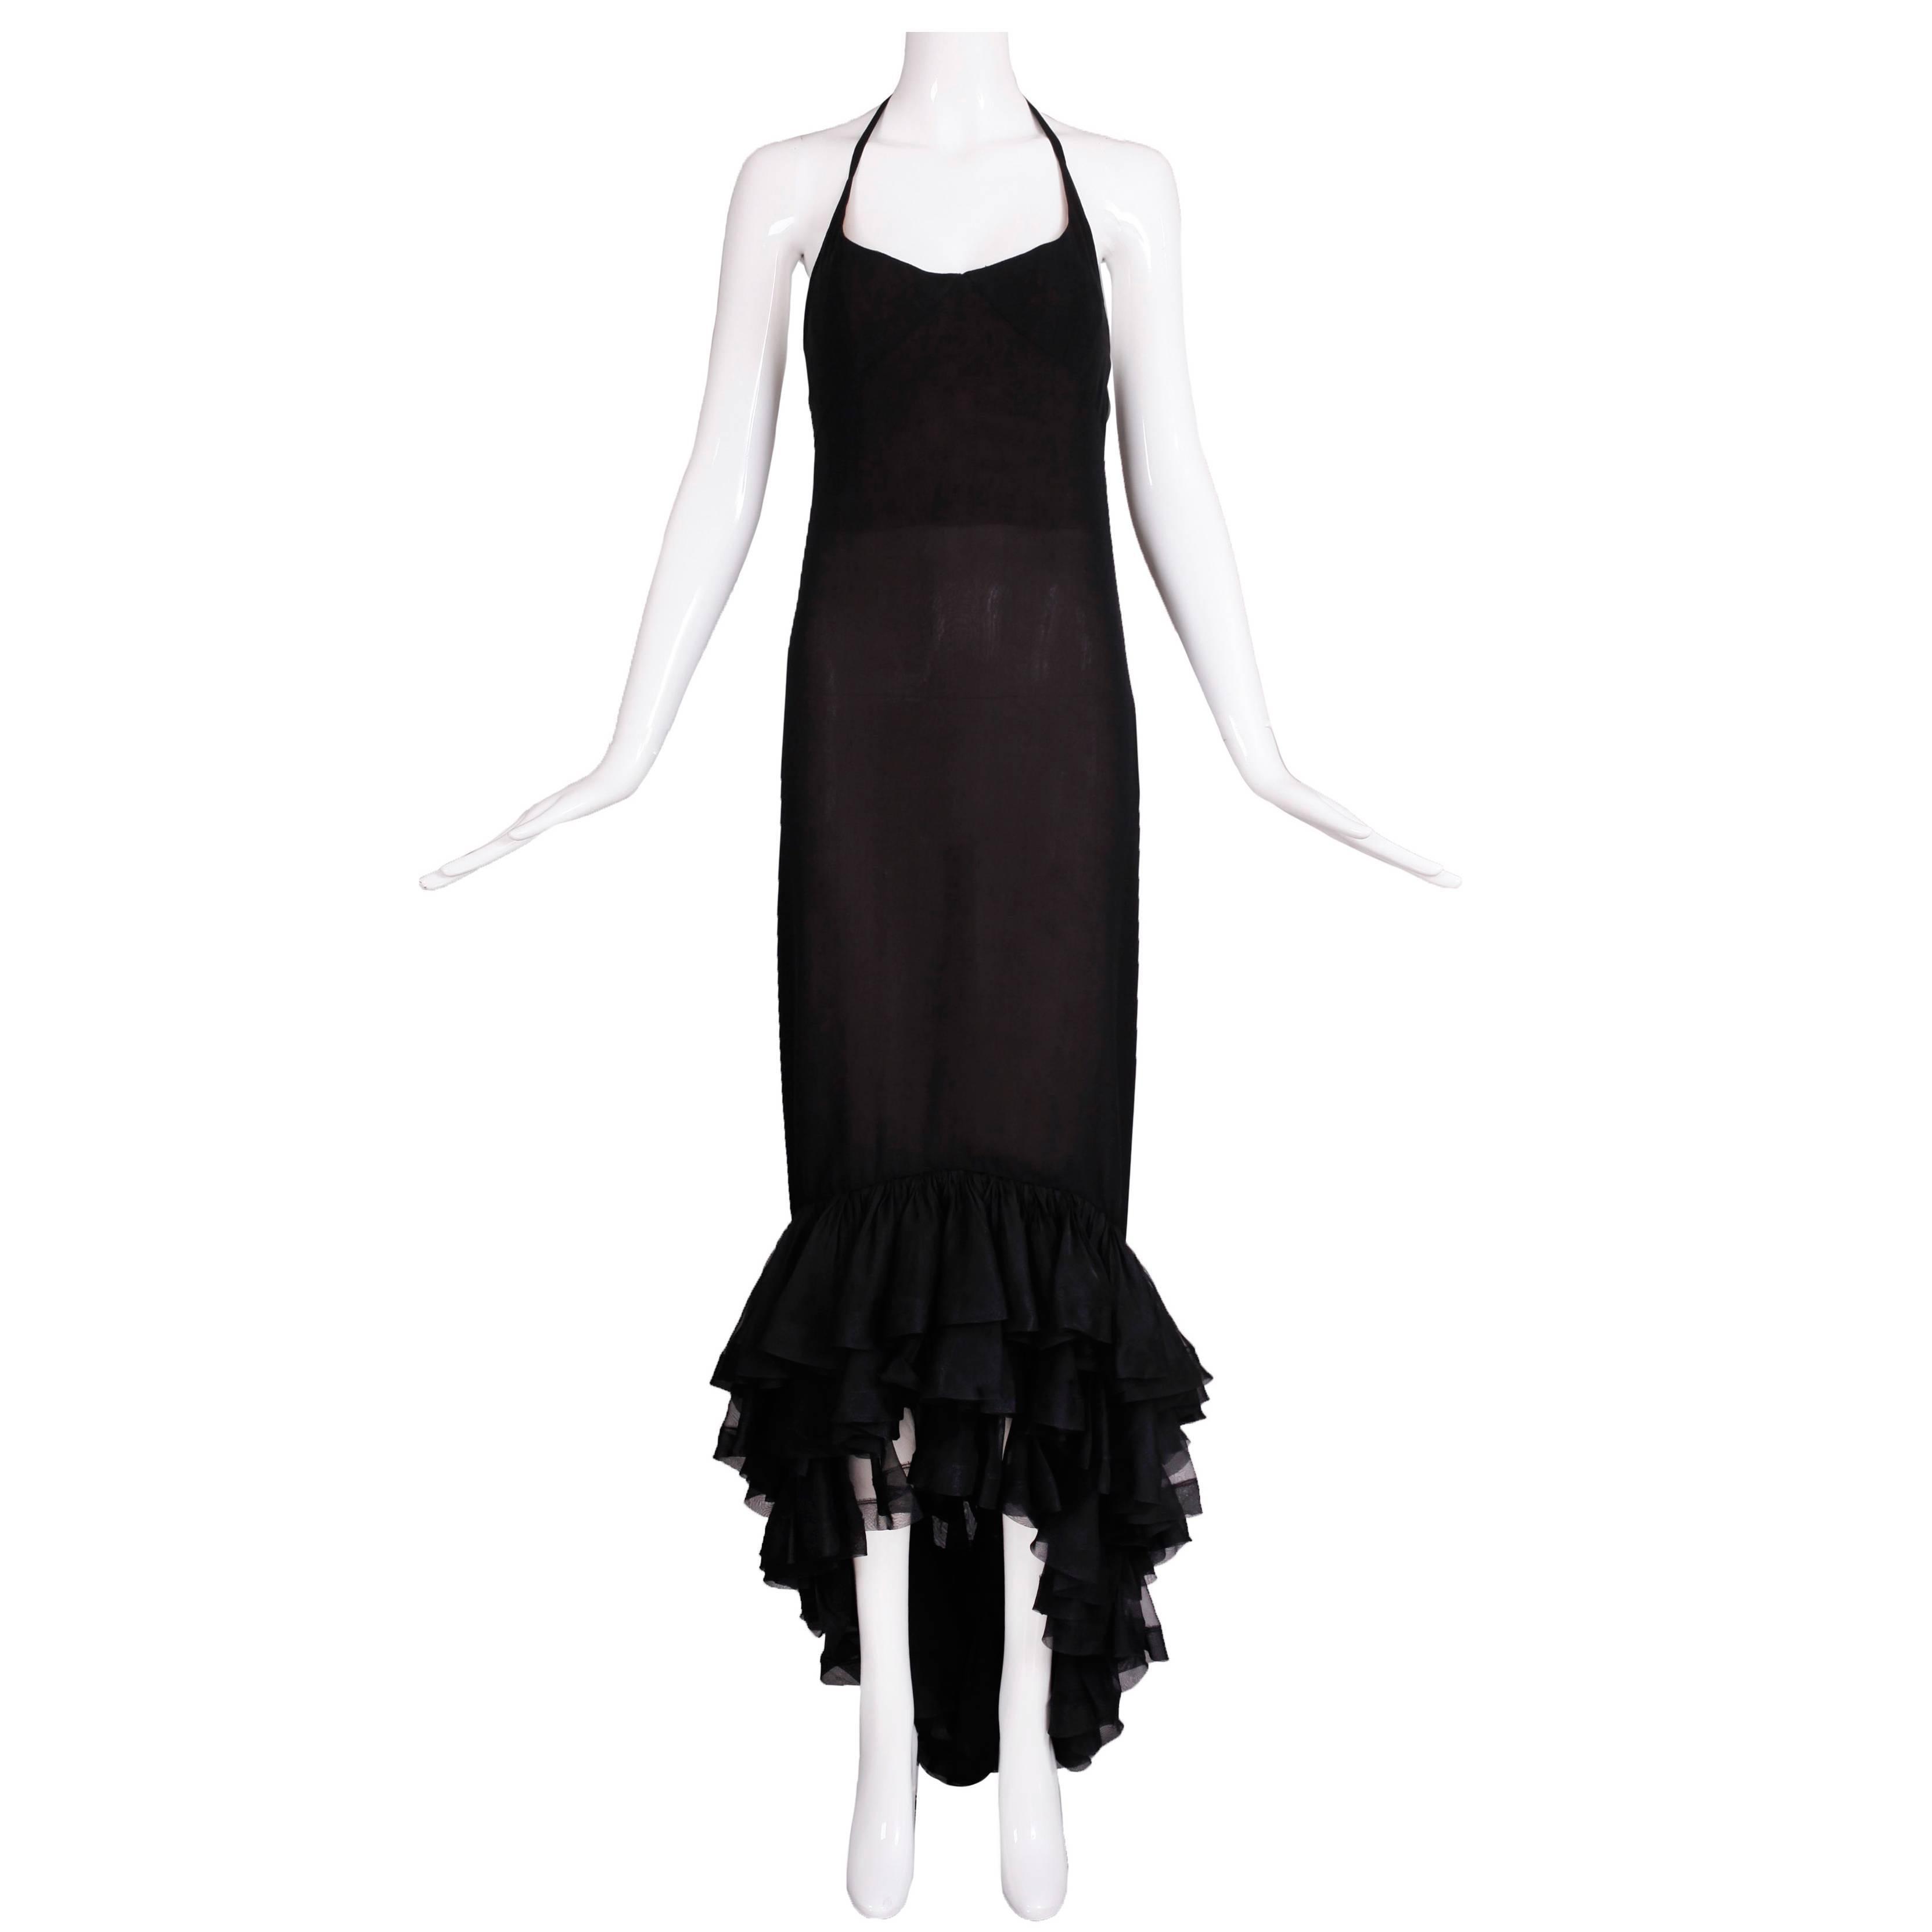 Vintage Pierre Balmain Haute Couture Black Silk Chiffon Evening Gown No.173.195